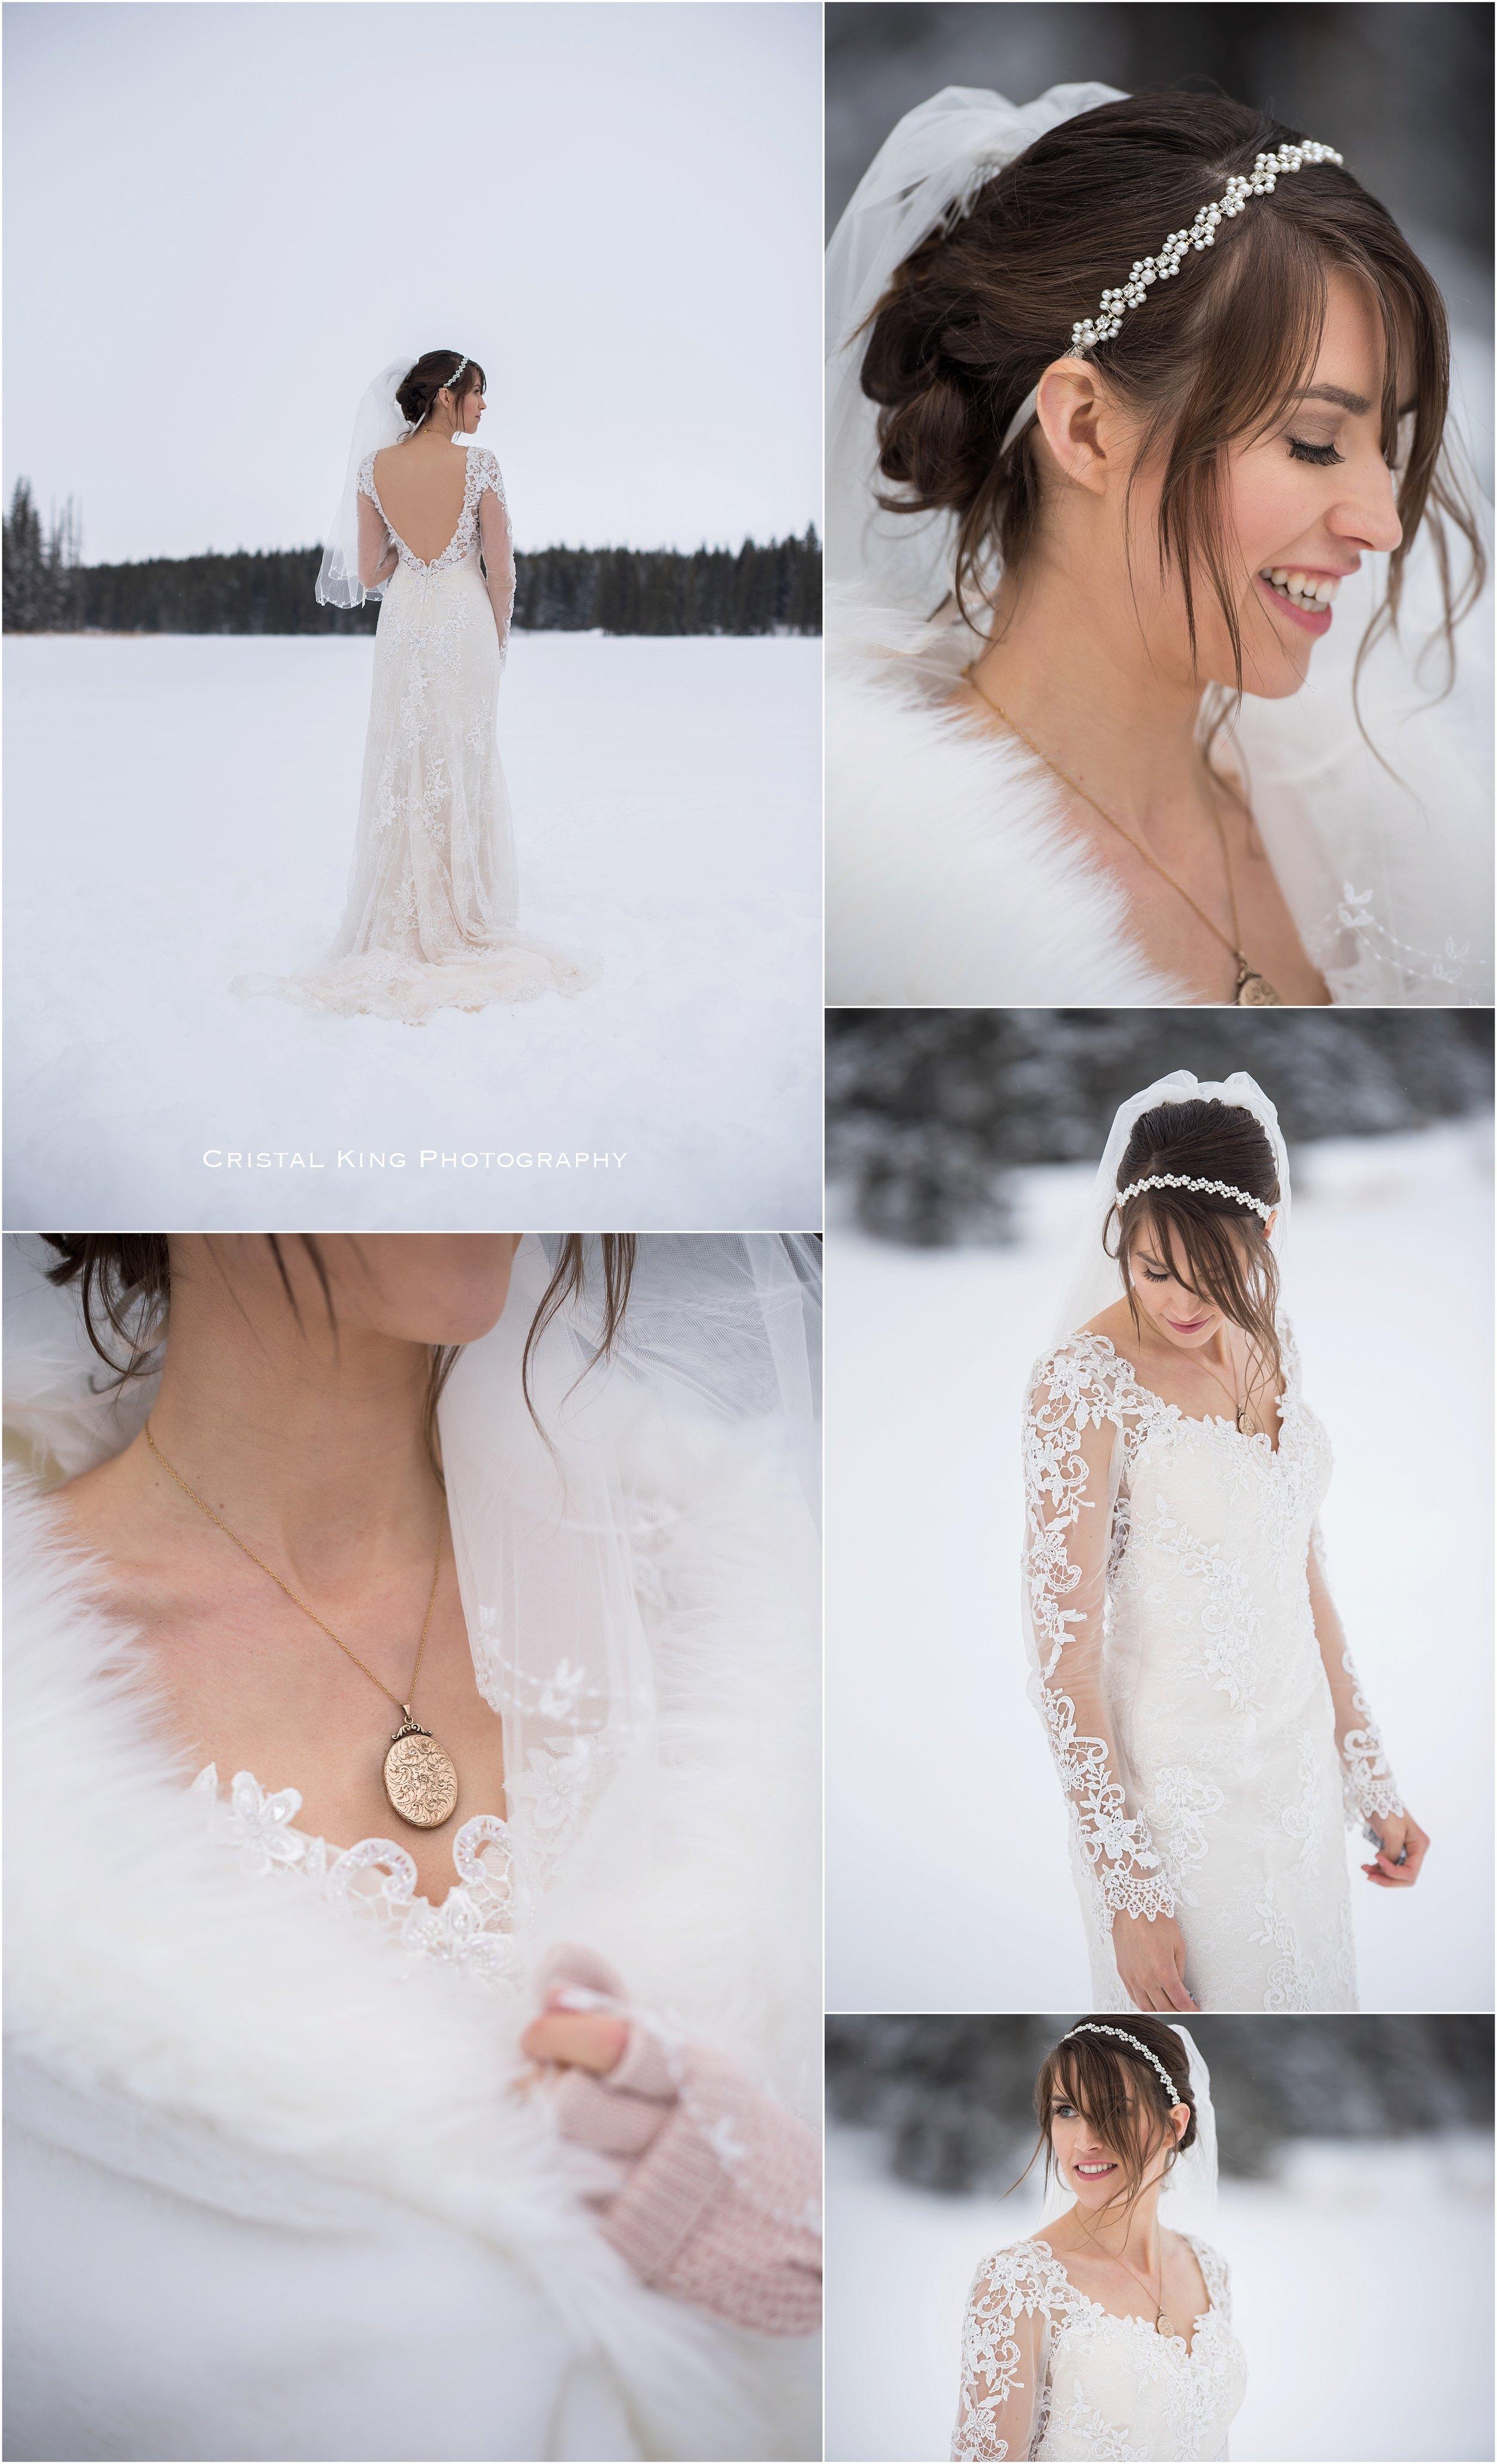 Jacqueline-Jasons-Wedding-110.jpg